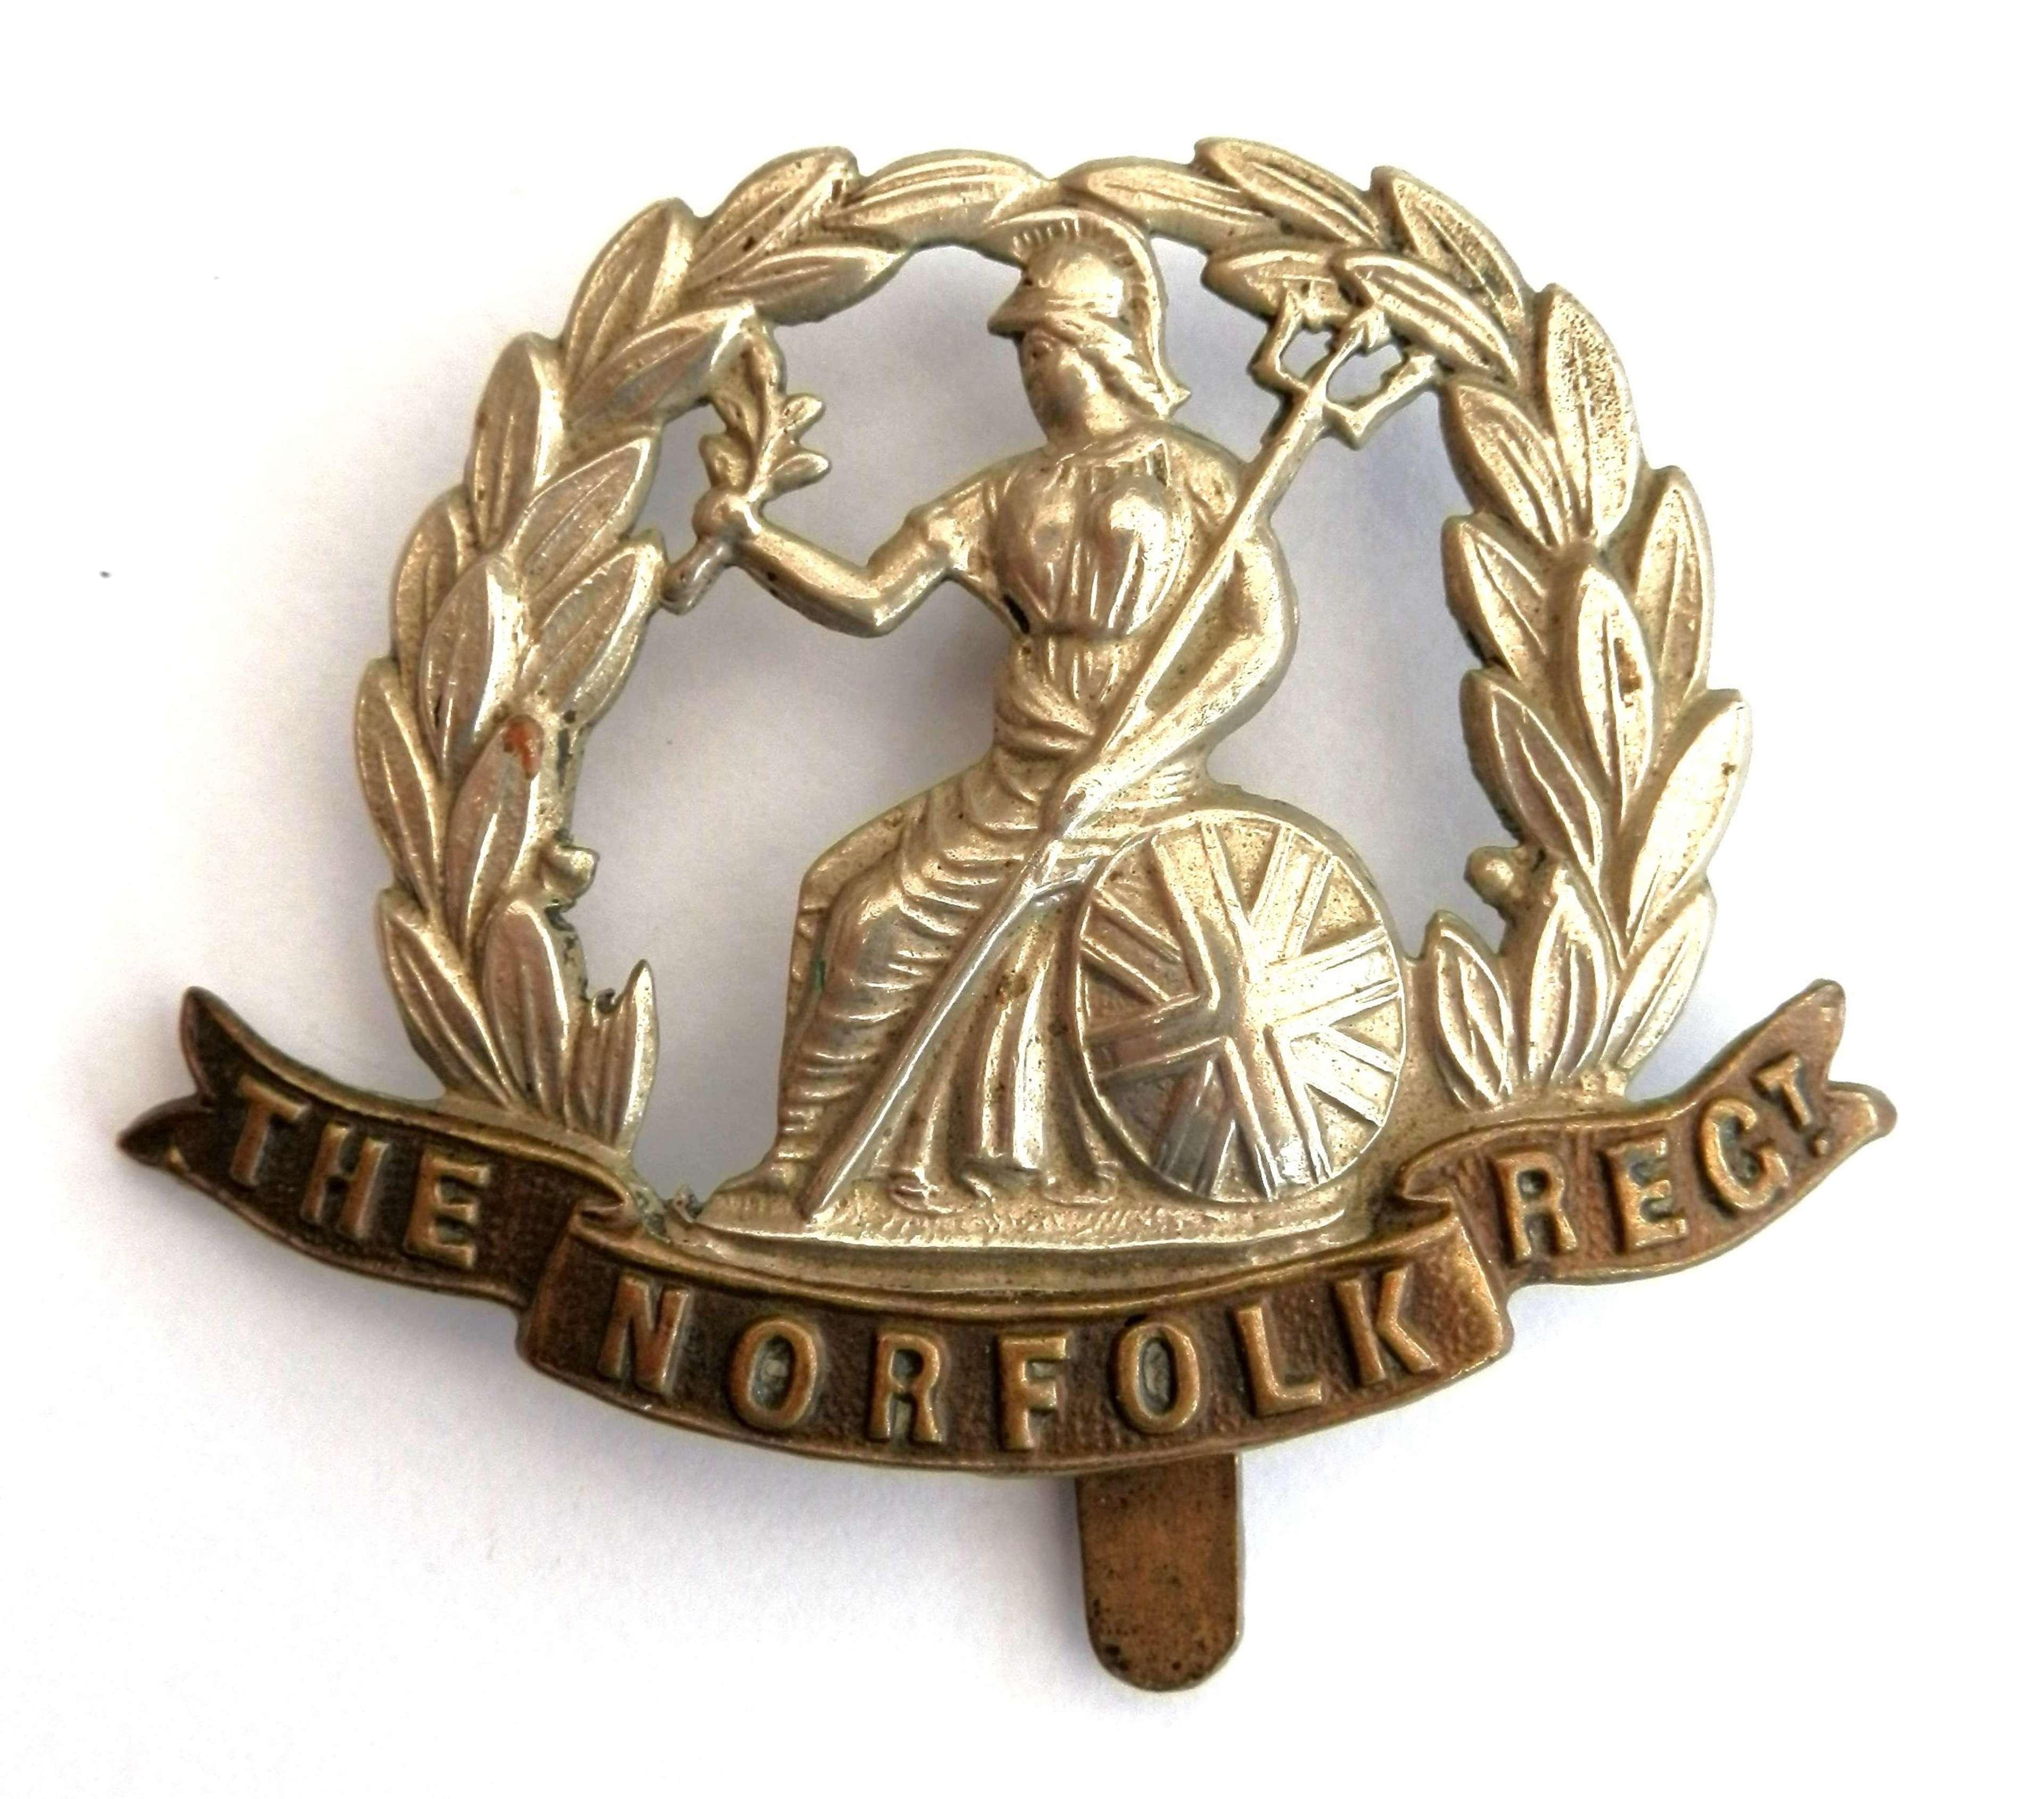 The Norfolk Regiment Cap Badge